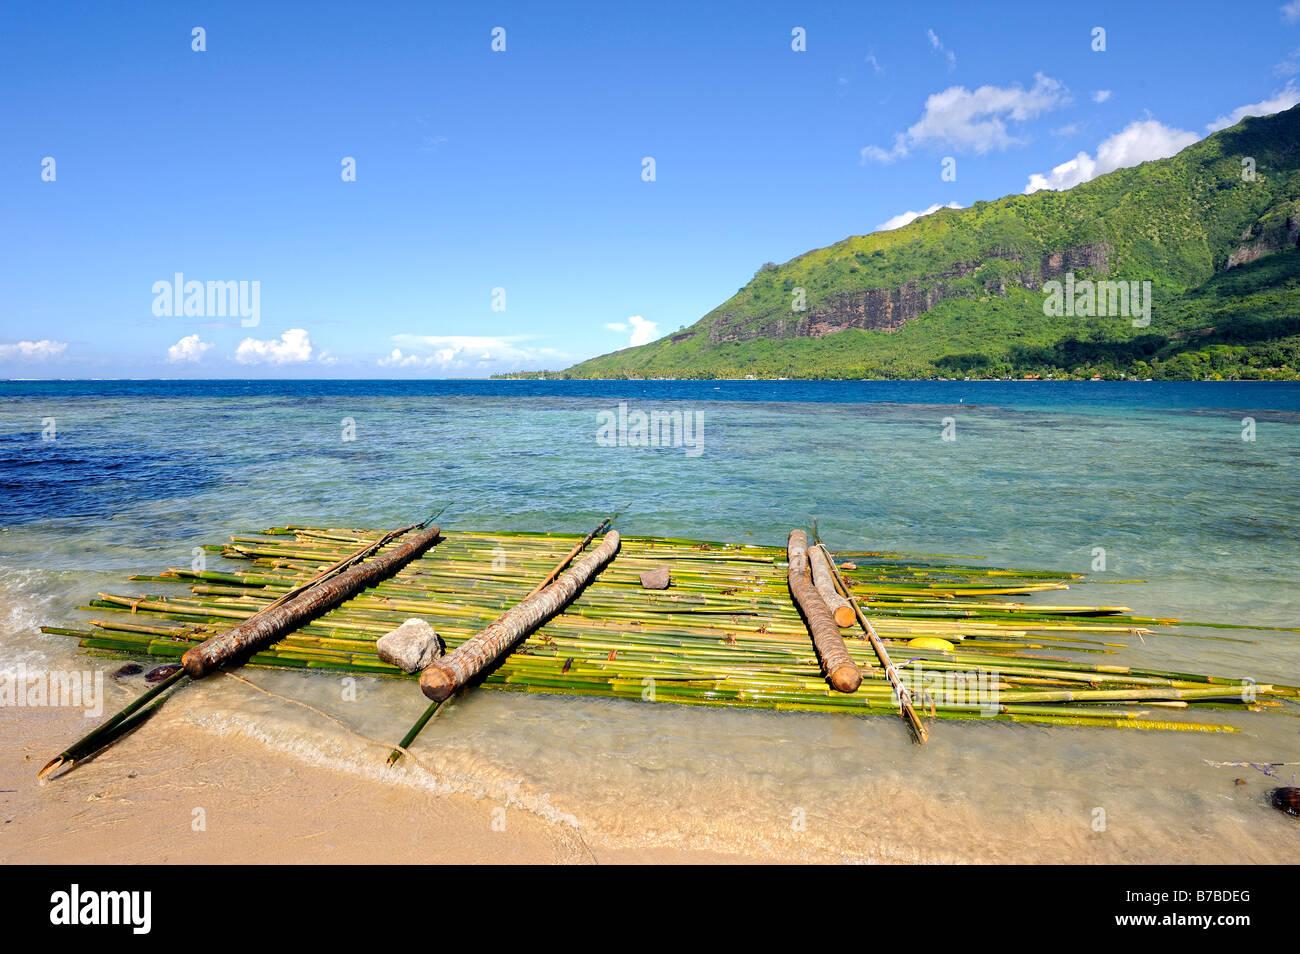 Raft in bamboo along the beach of Opunohu Bay, Moorea, French Polynesia - Stock Image